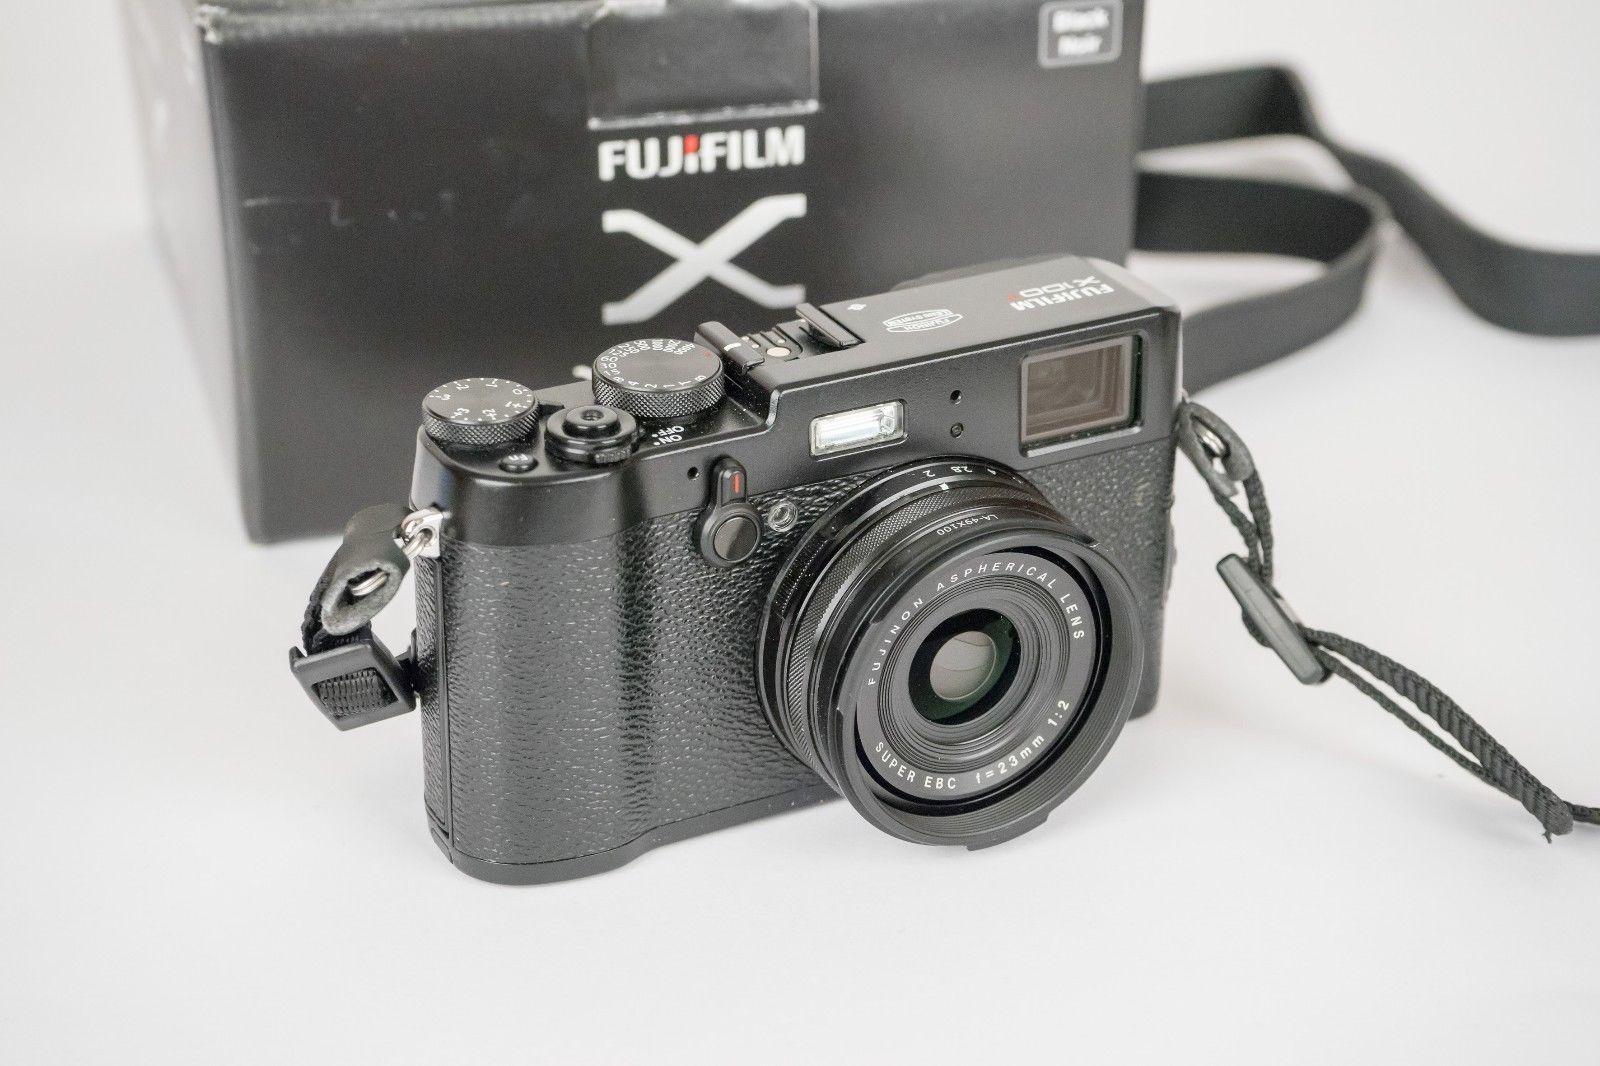 Fujifilm FinePix X Series X100T 16.3MP Digitalkamera - Schwarz (Nur Gehäuse)